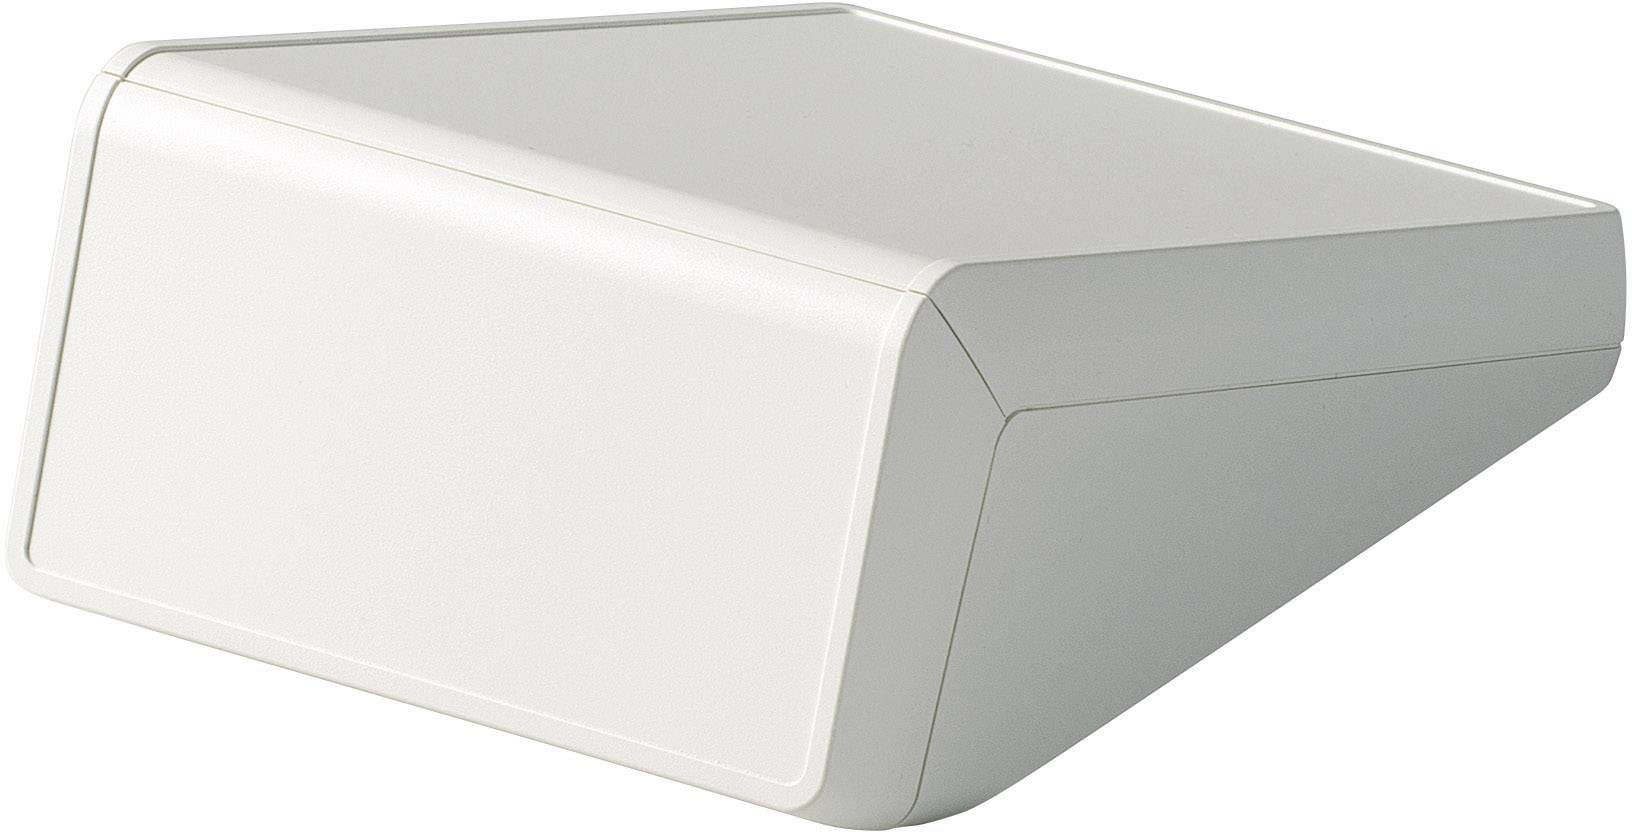 Skrinka na ovládací pult OKW UNITEC D4056107, 148 x 210 x 80 mm, ABS, sivobiela, 1 ks